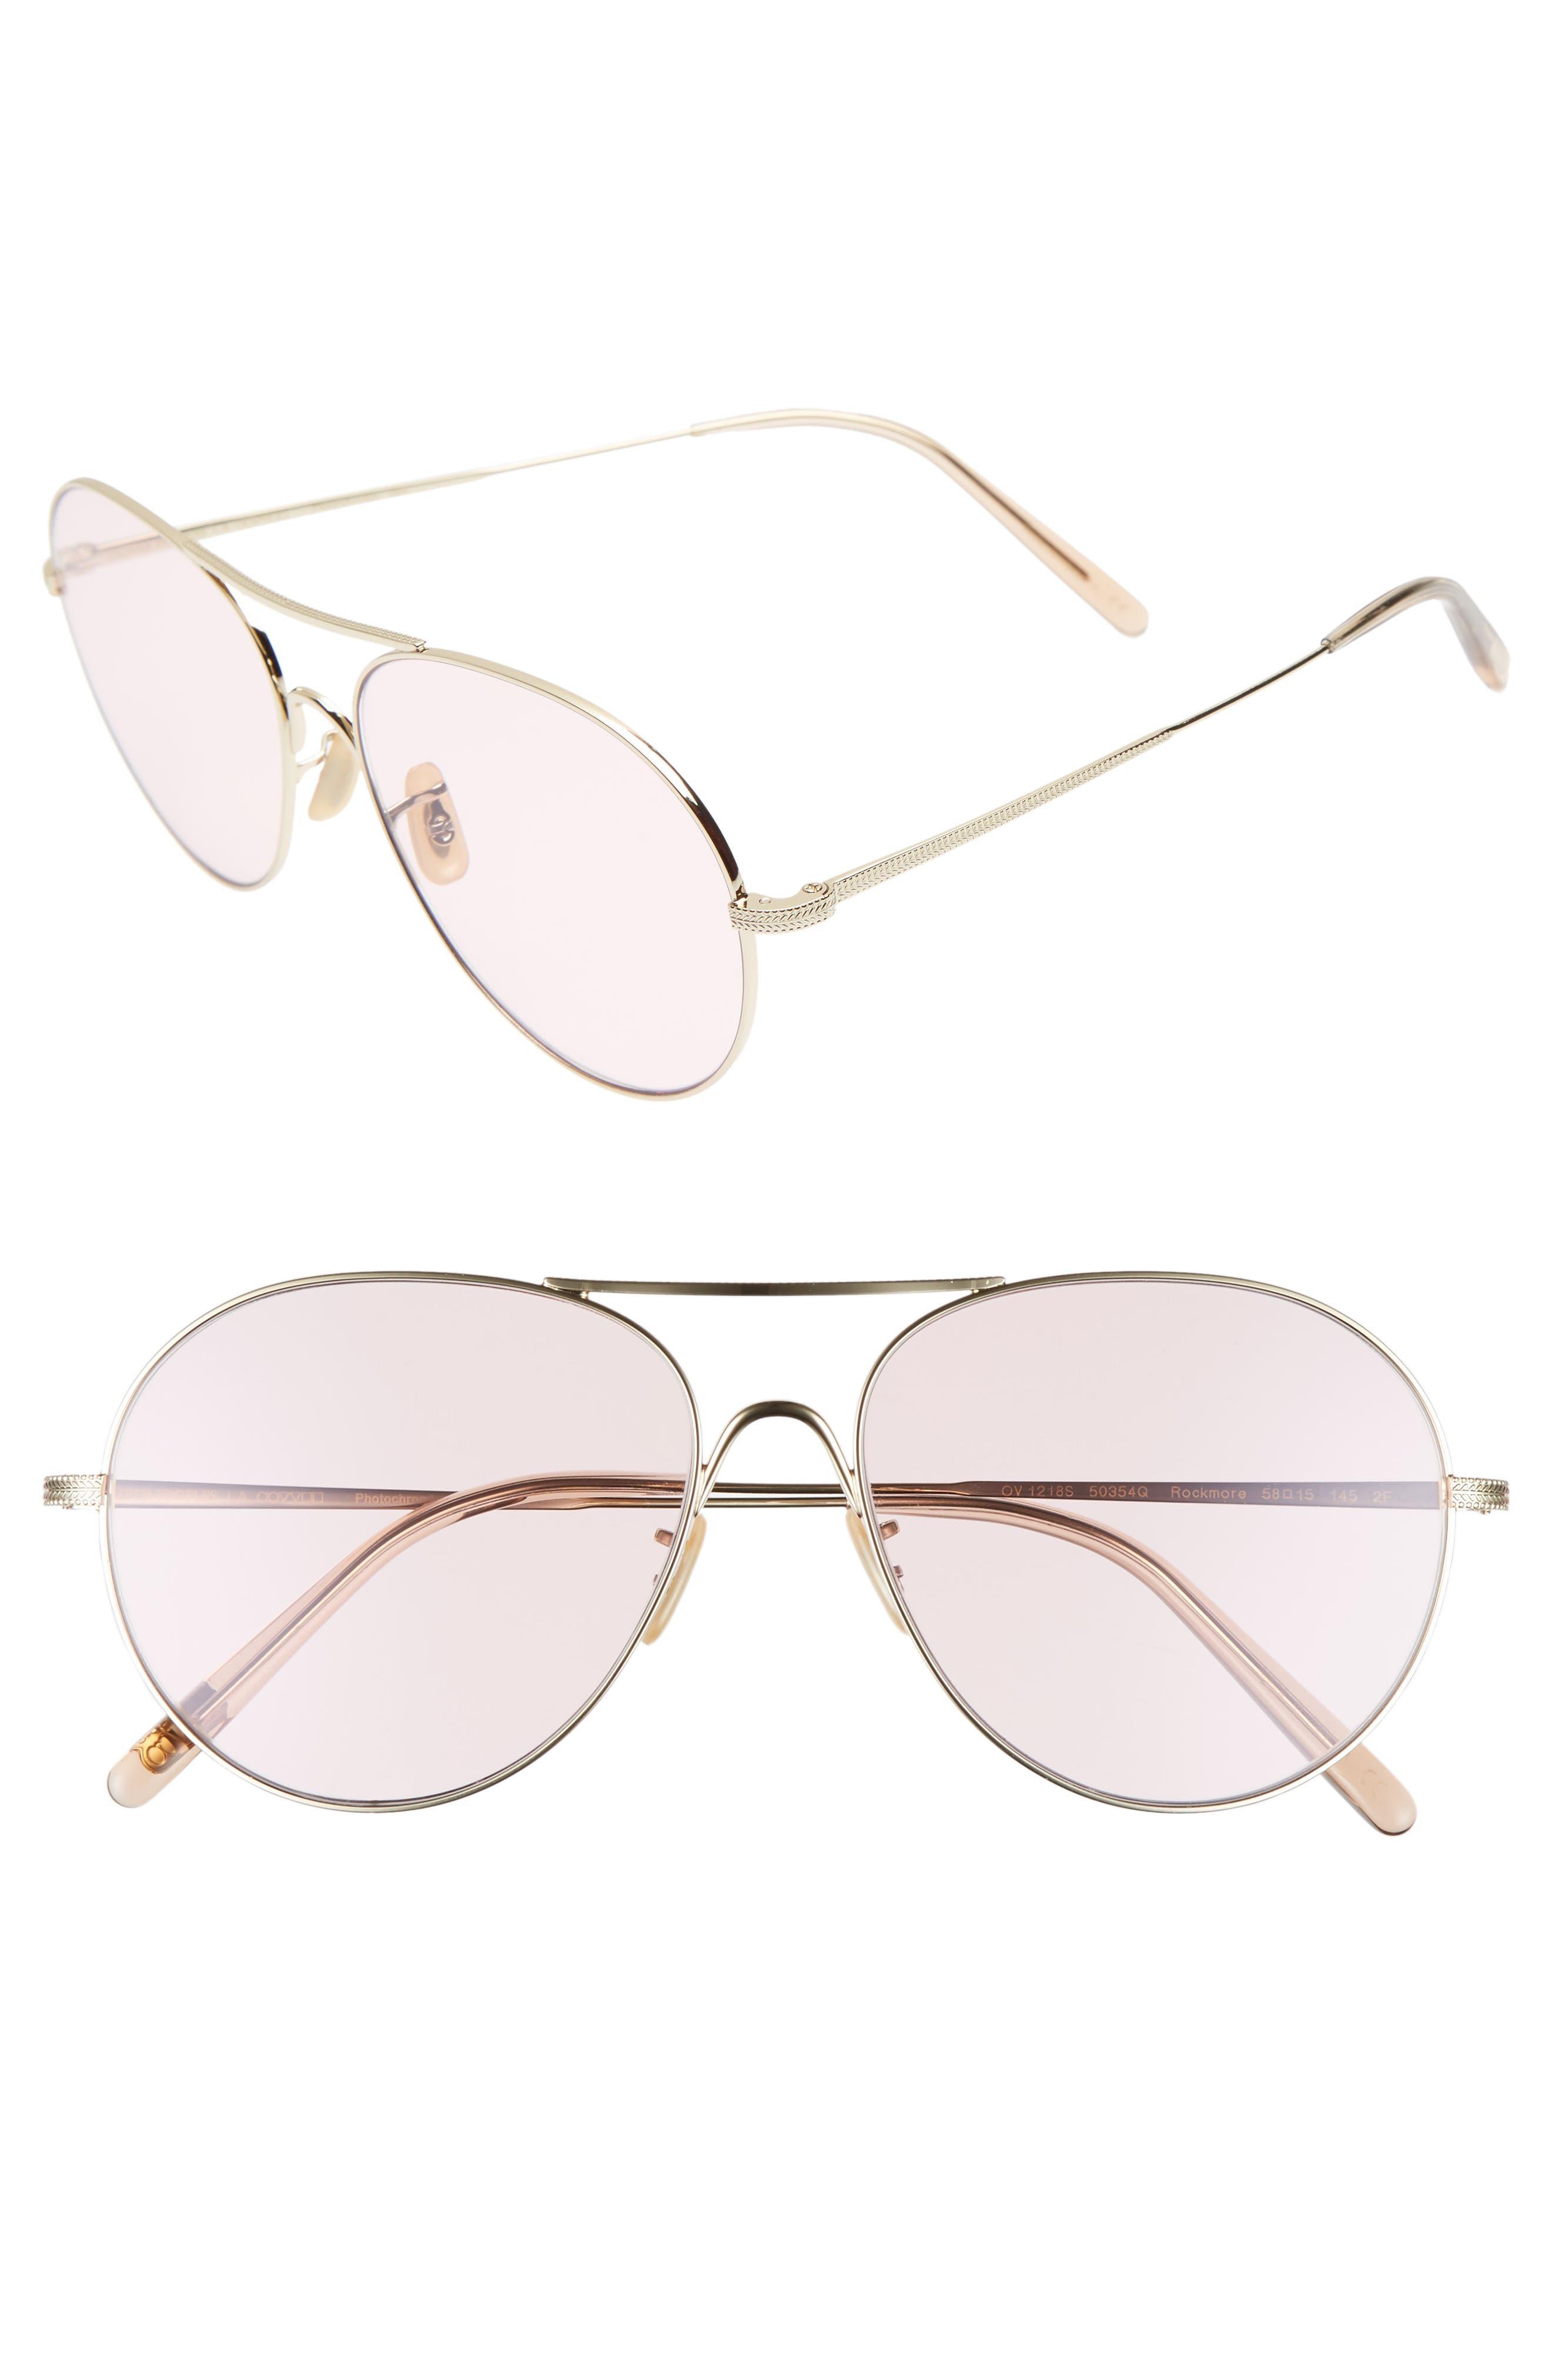 Rockmore 58mm Aviator Sunglasses,                             Main thumbnail 1, color,                             PINK